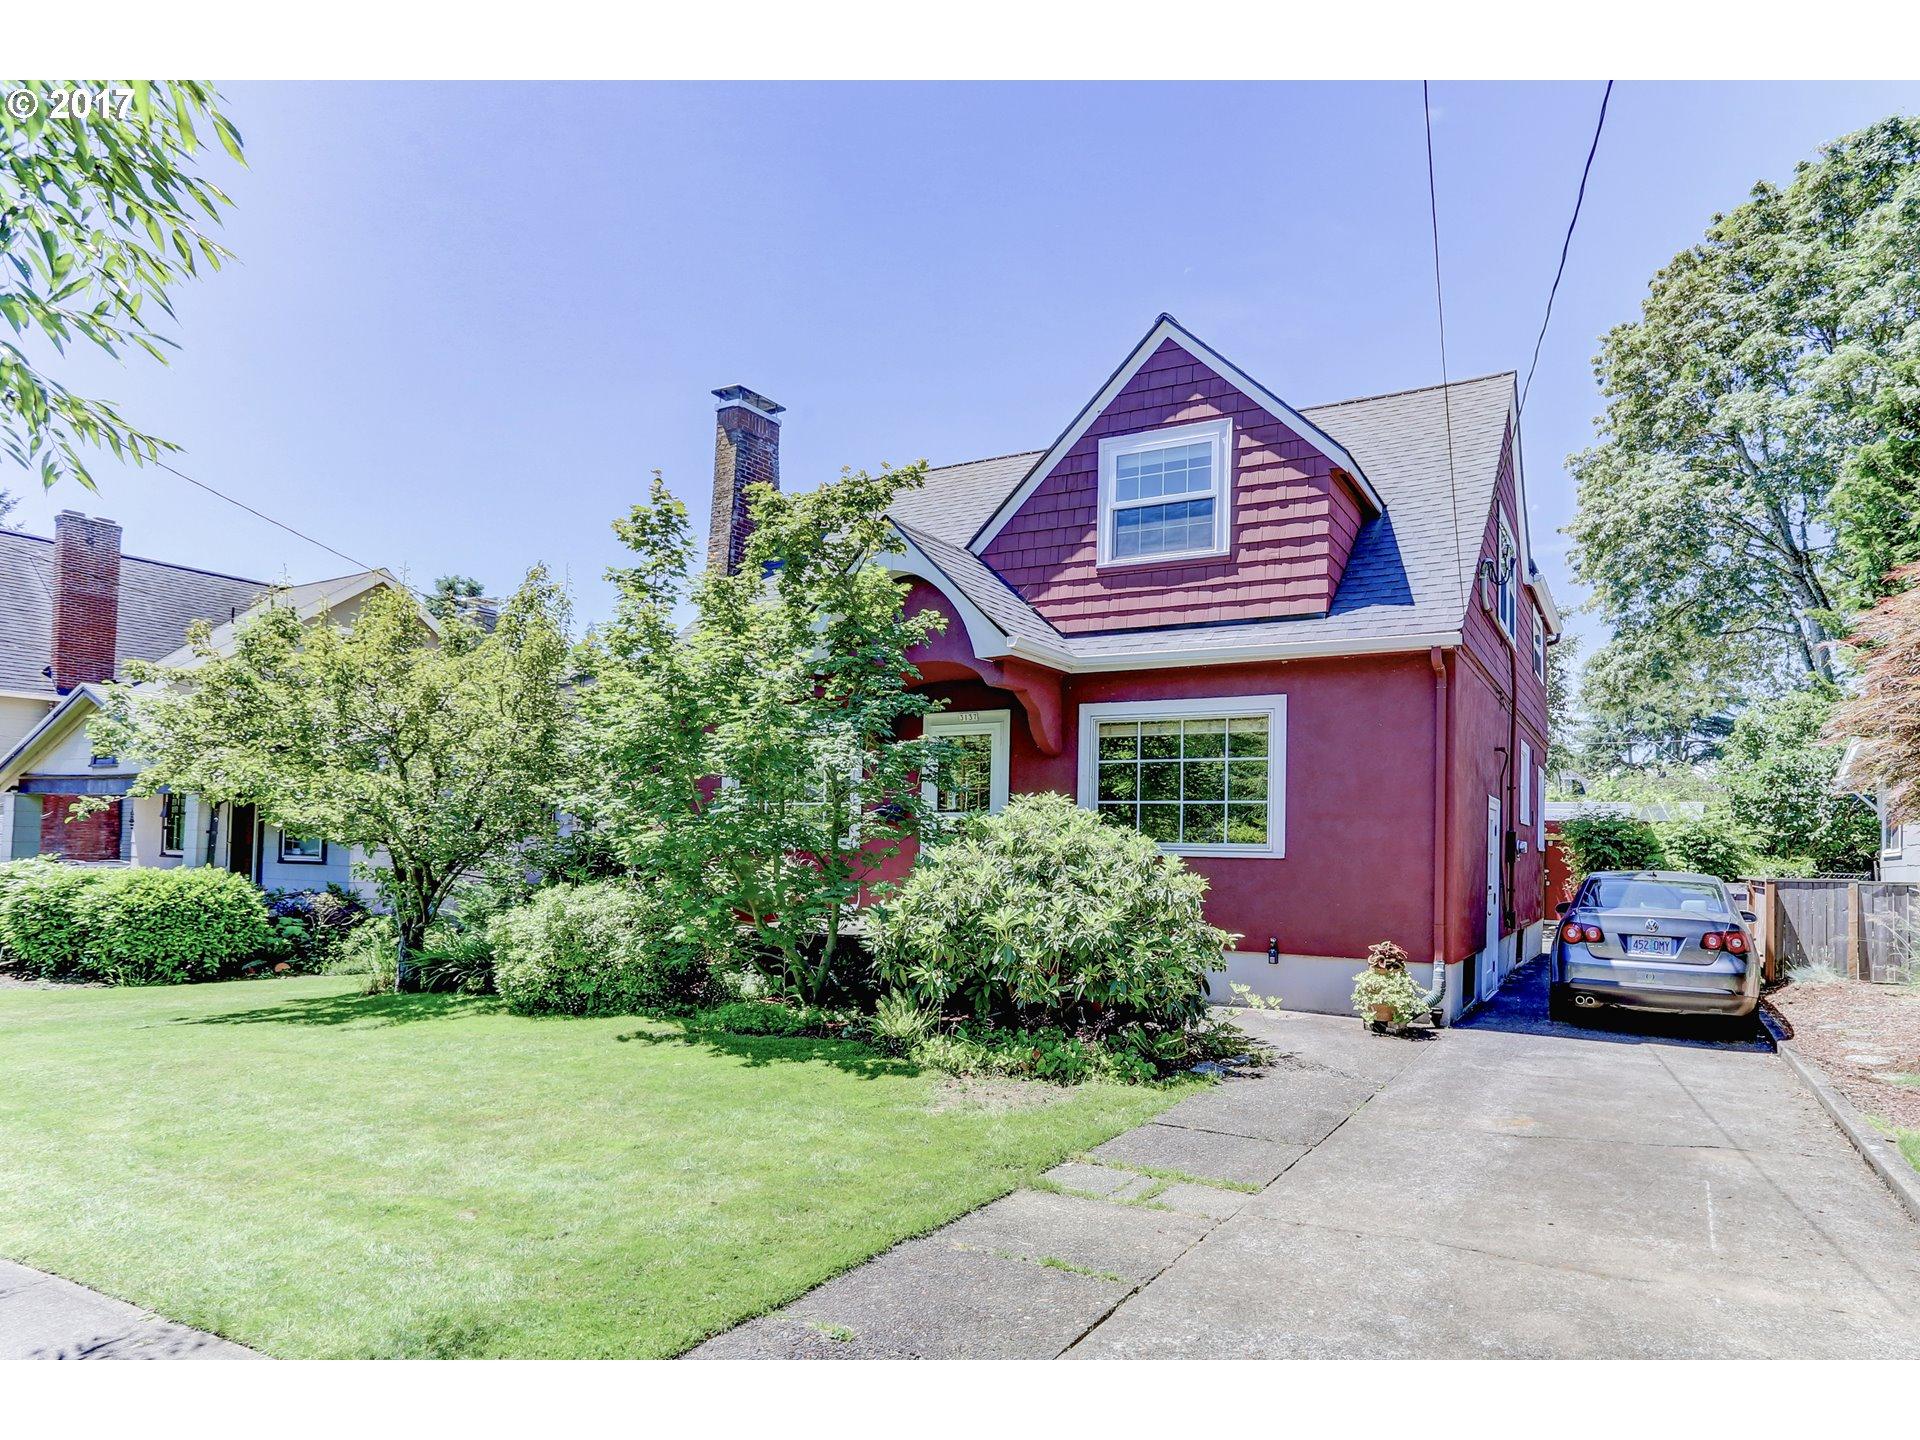 3137 NE 32ND AVE Portland, OR 97212 - MLS #: 17274810